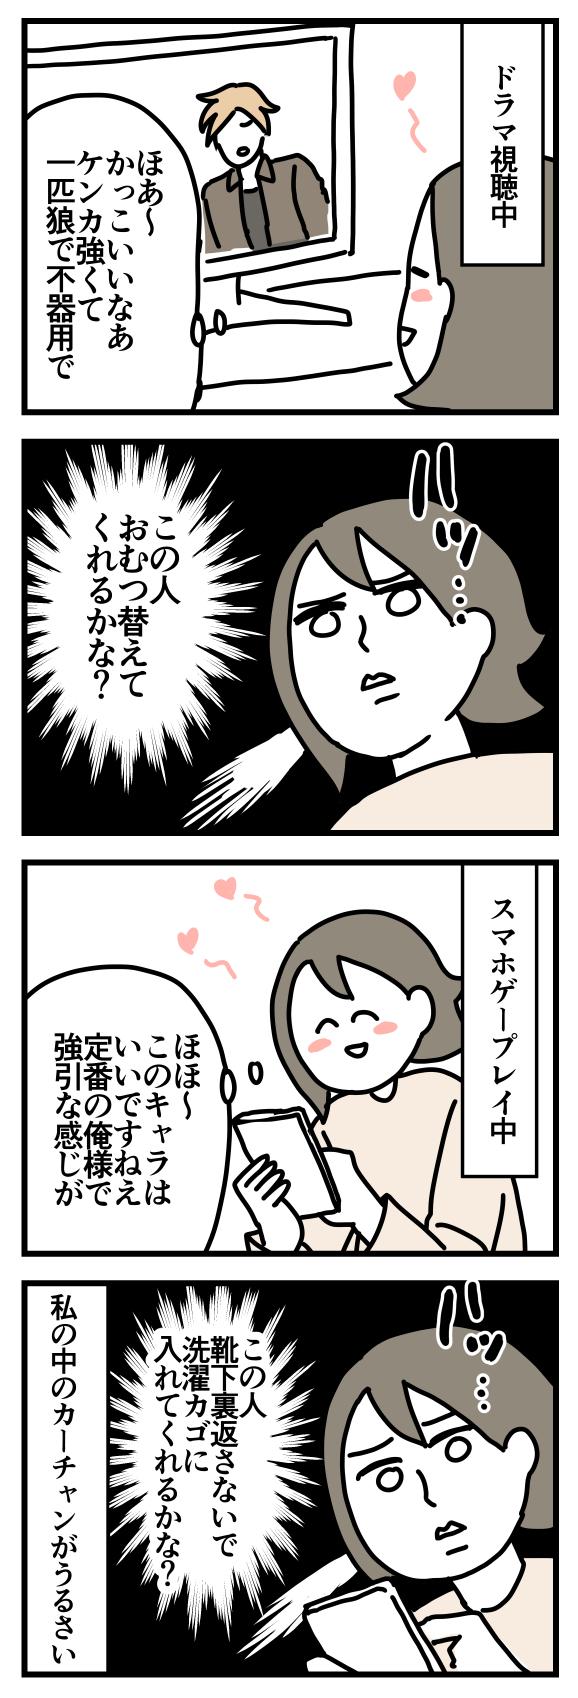 f:id:kanemotonomukuu:20171022205117j:plain